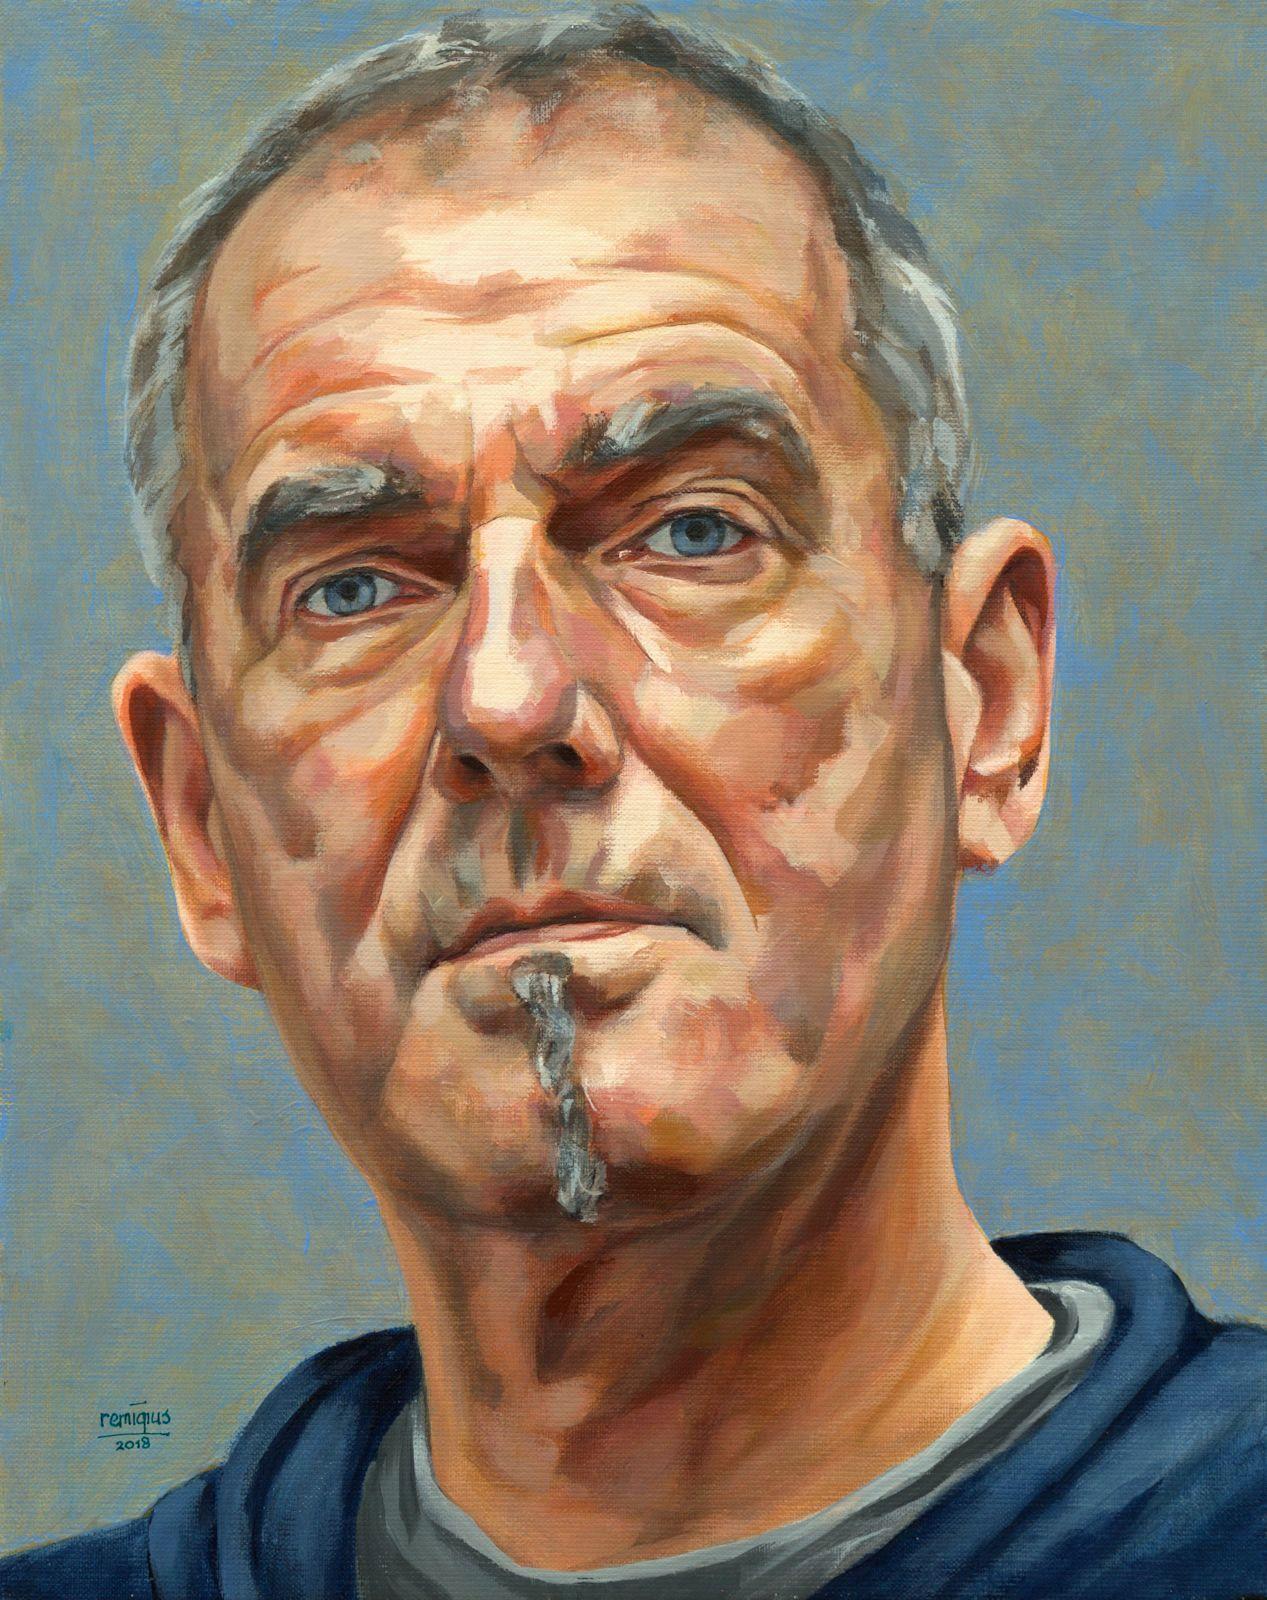 zelfportret schilder